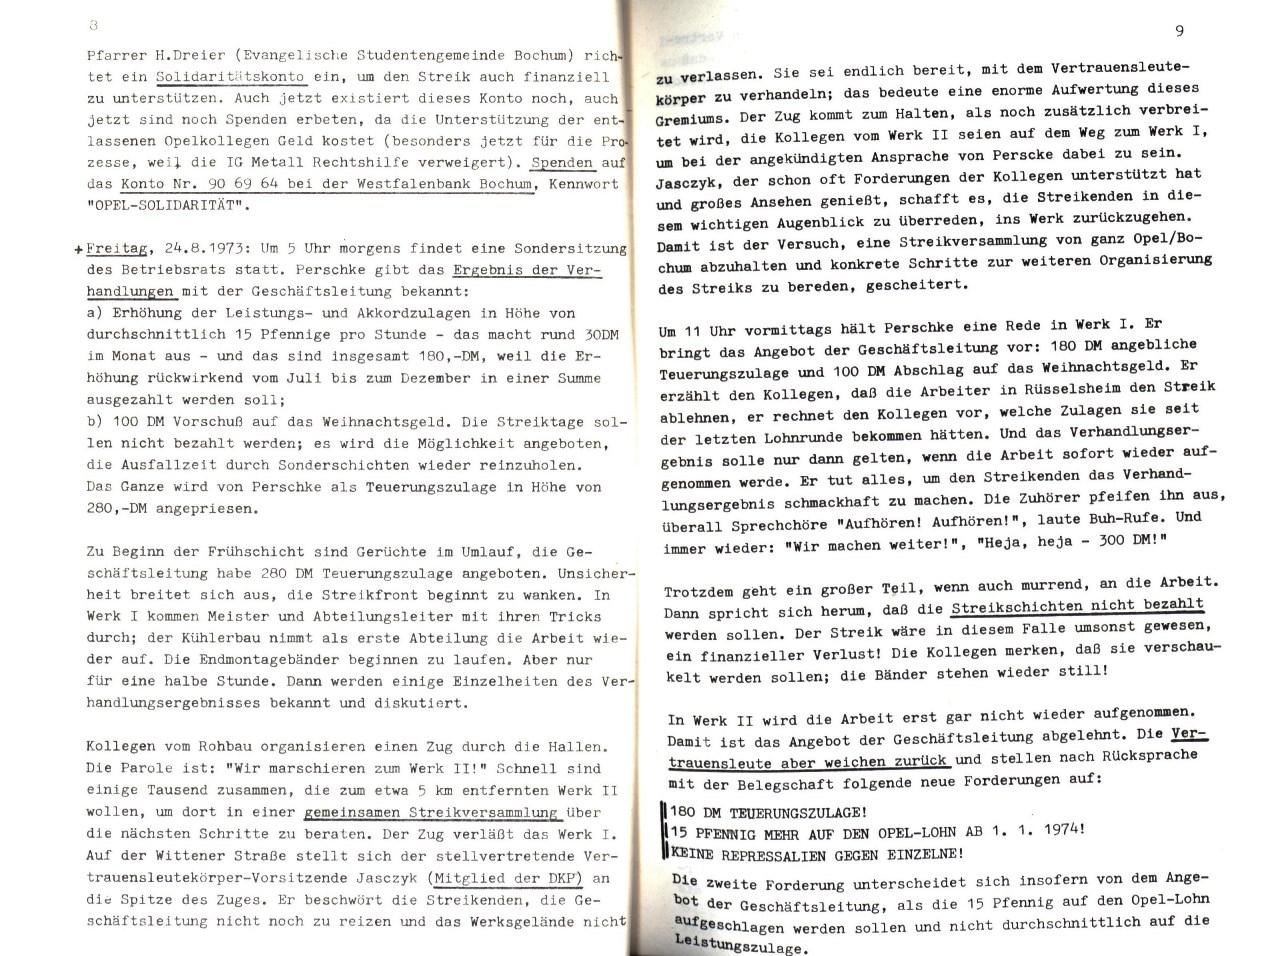 Bochum_IGM_Opel_PG_Opel_streikt_1973_006